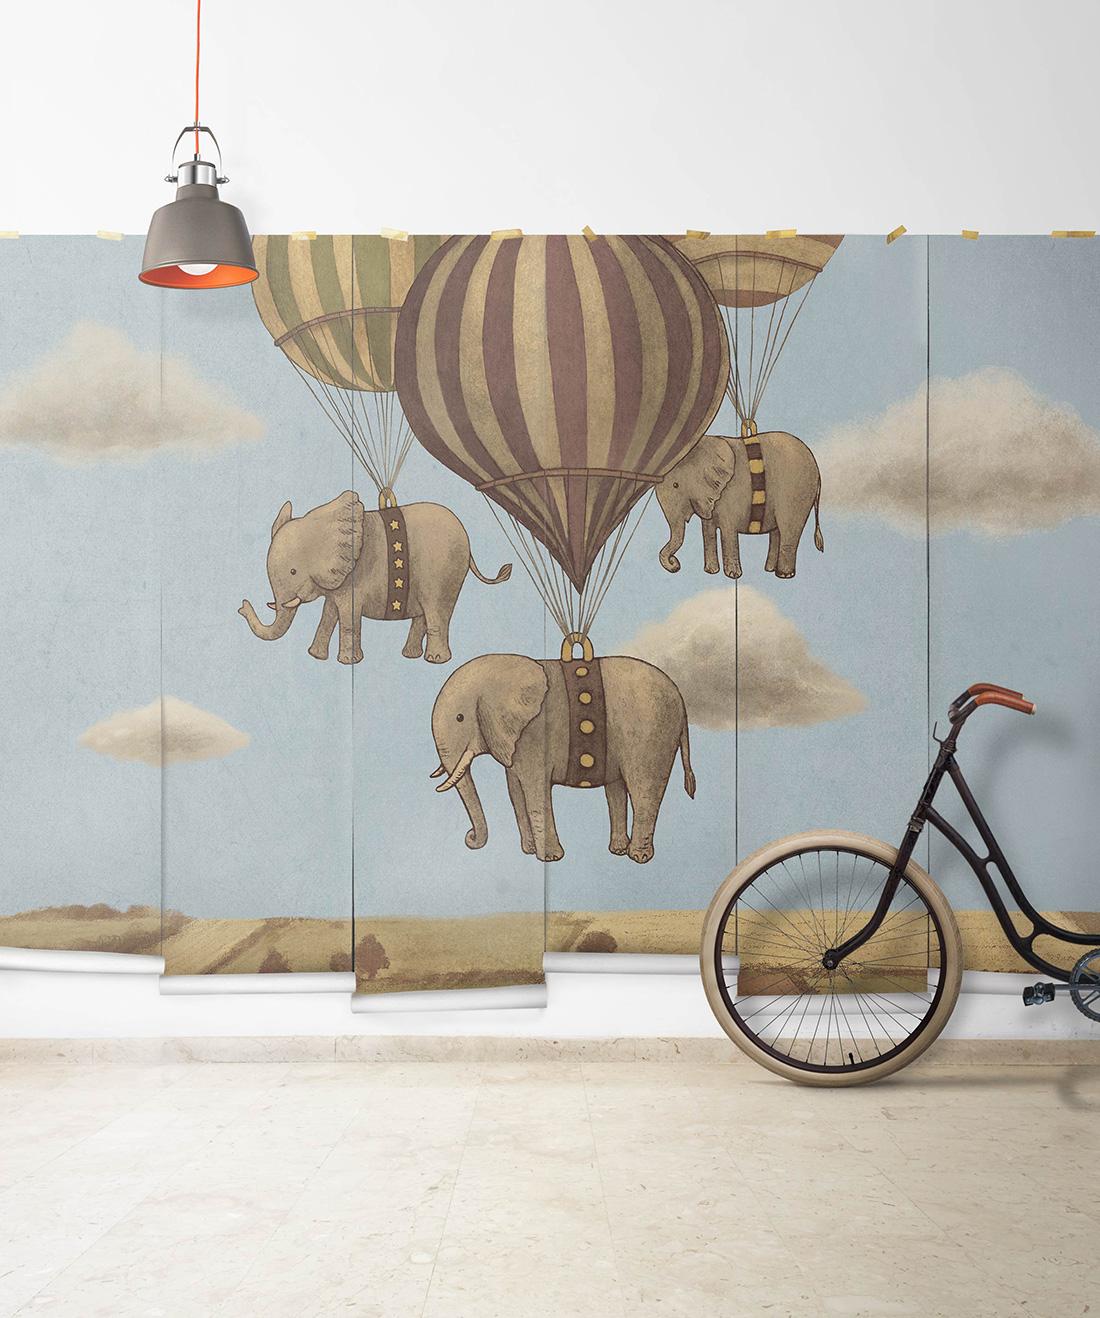 Flight of the Elephants Mural